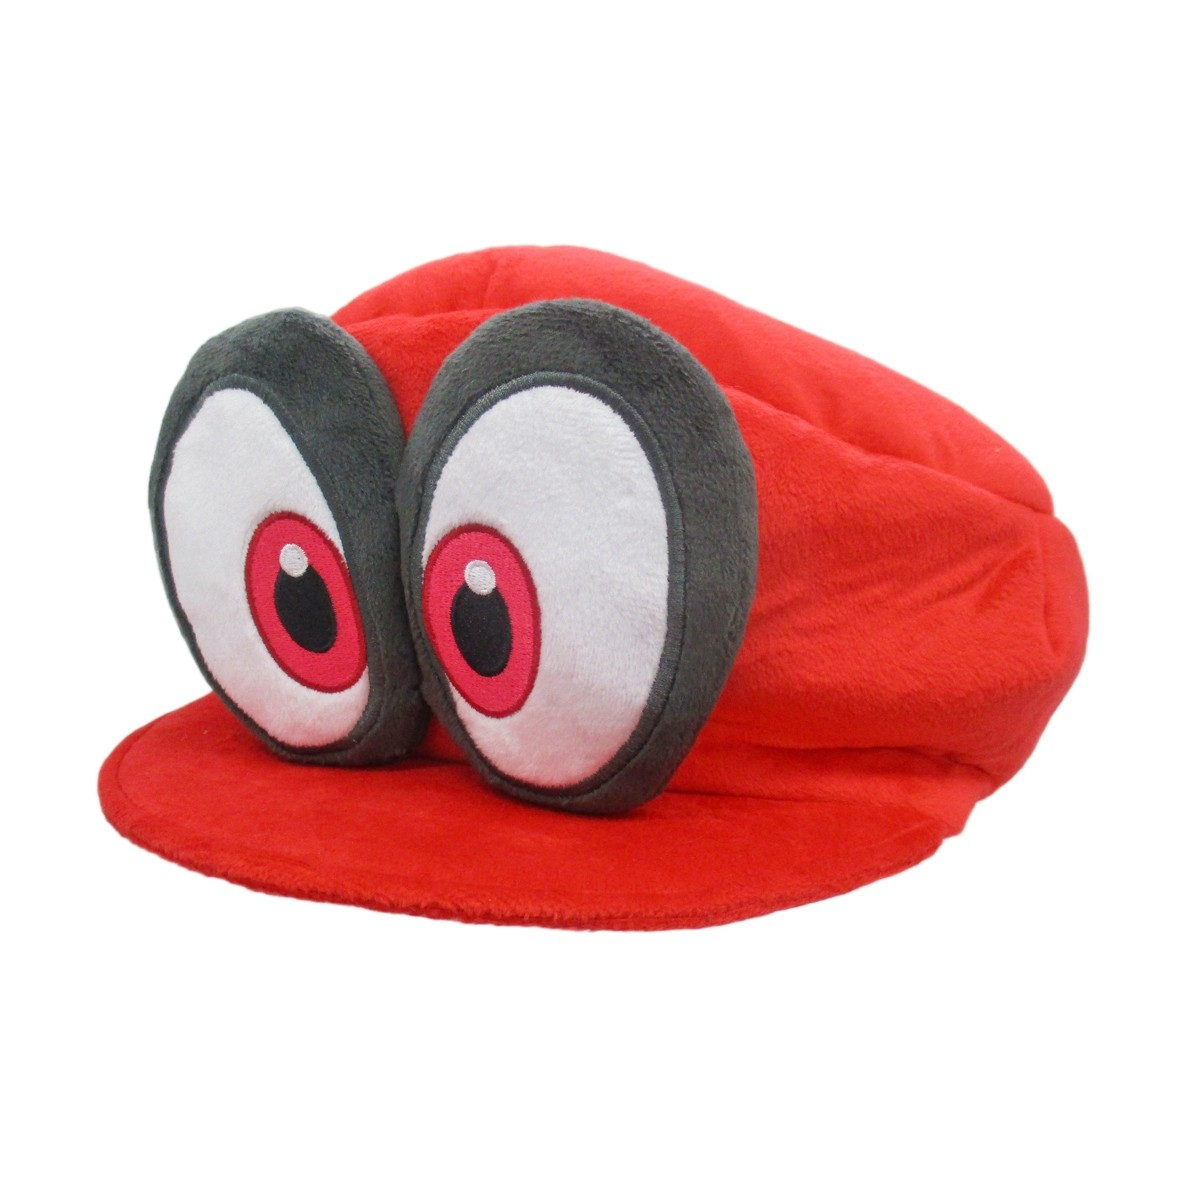 Cappy Hat Wearable Plush Super Mario Plush